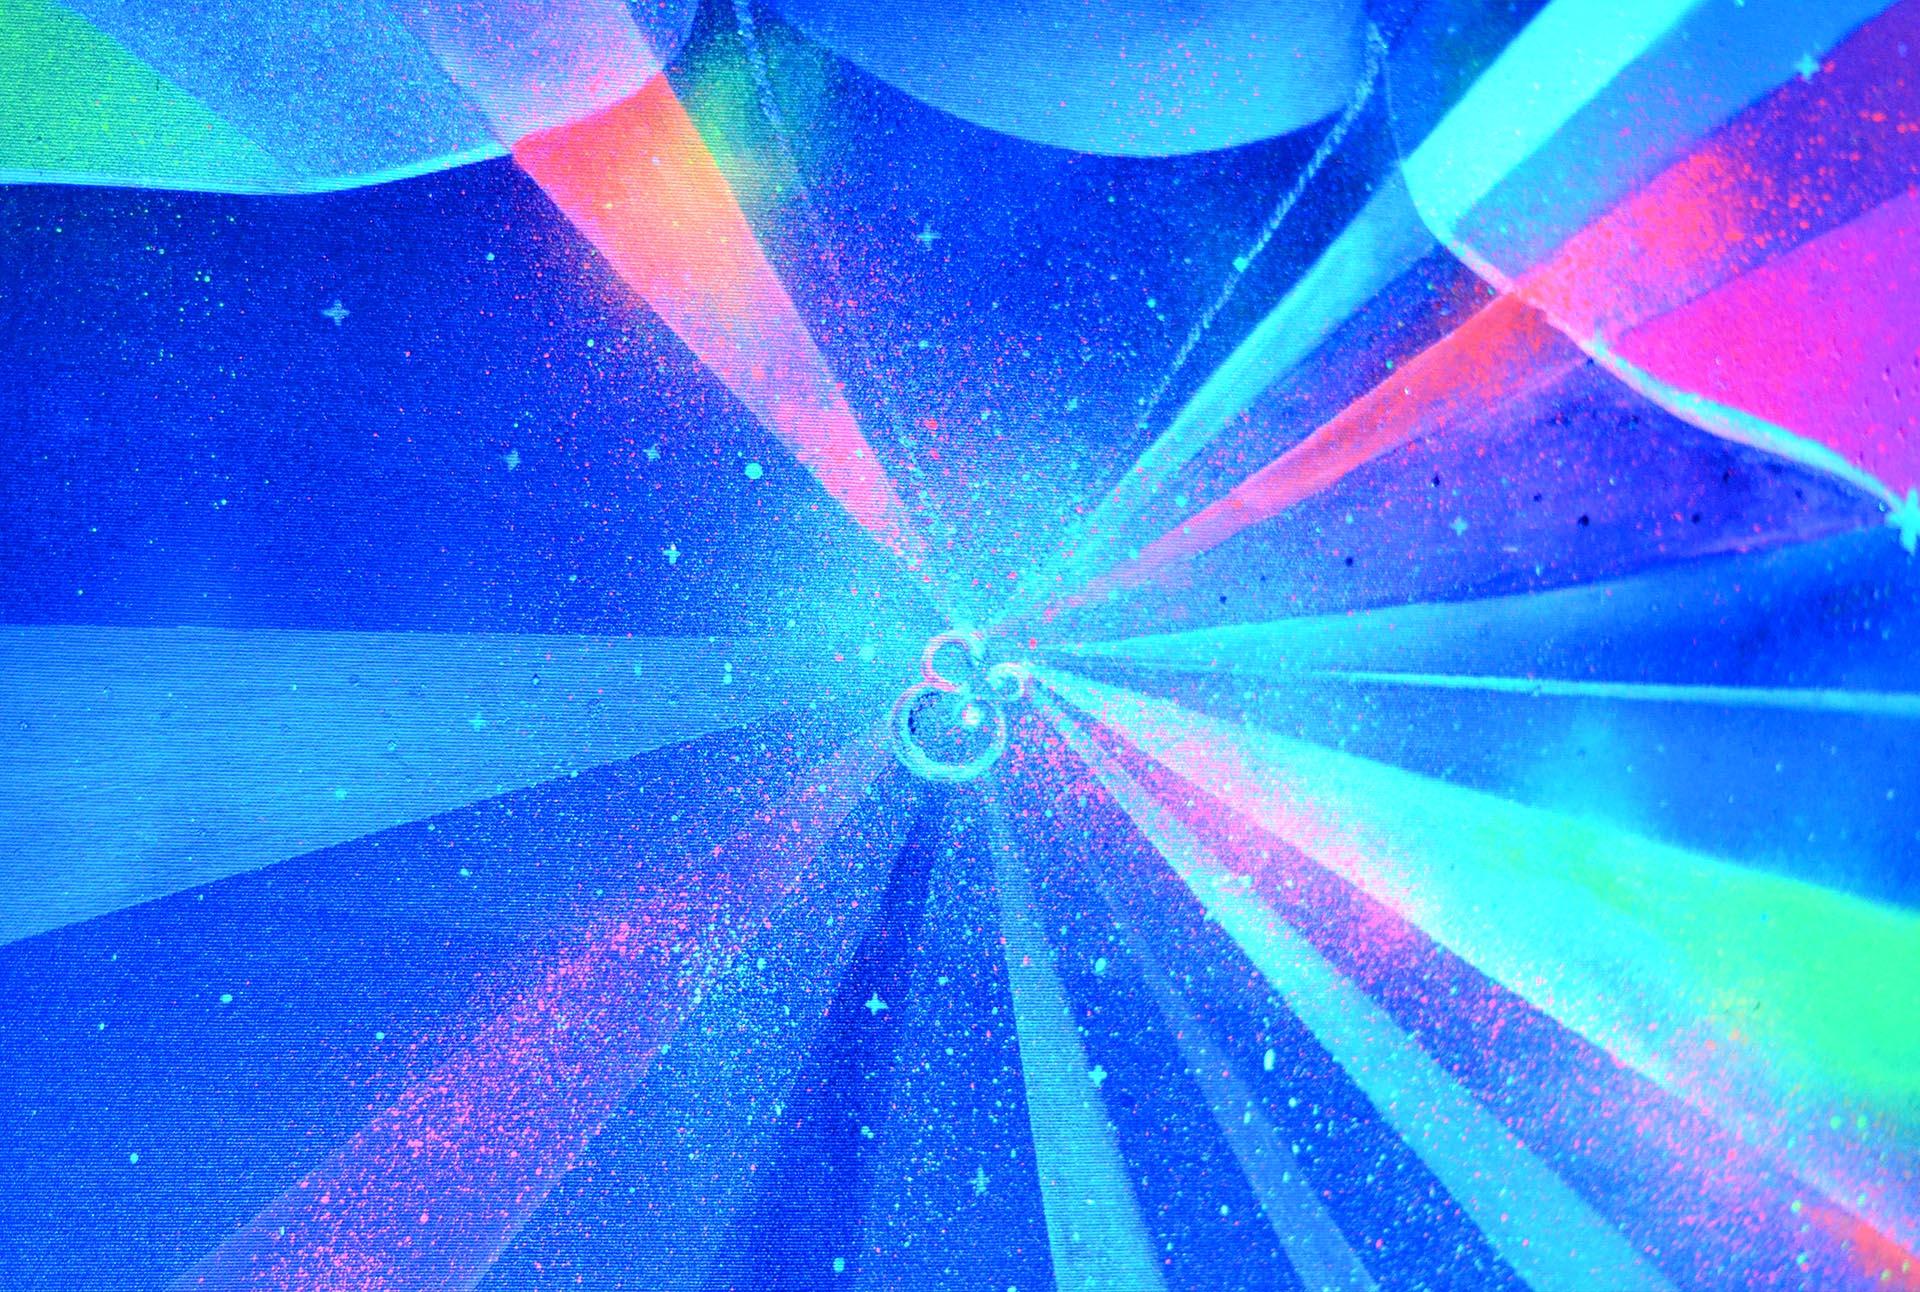 Neon Lady by Eduardo Morales con luz azul (detalle)